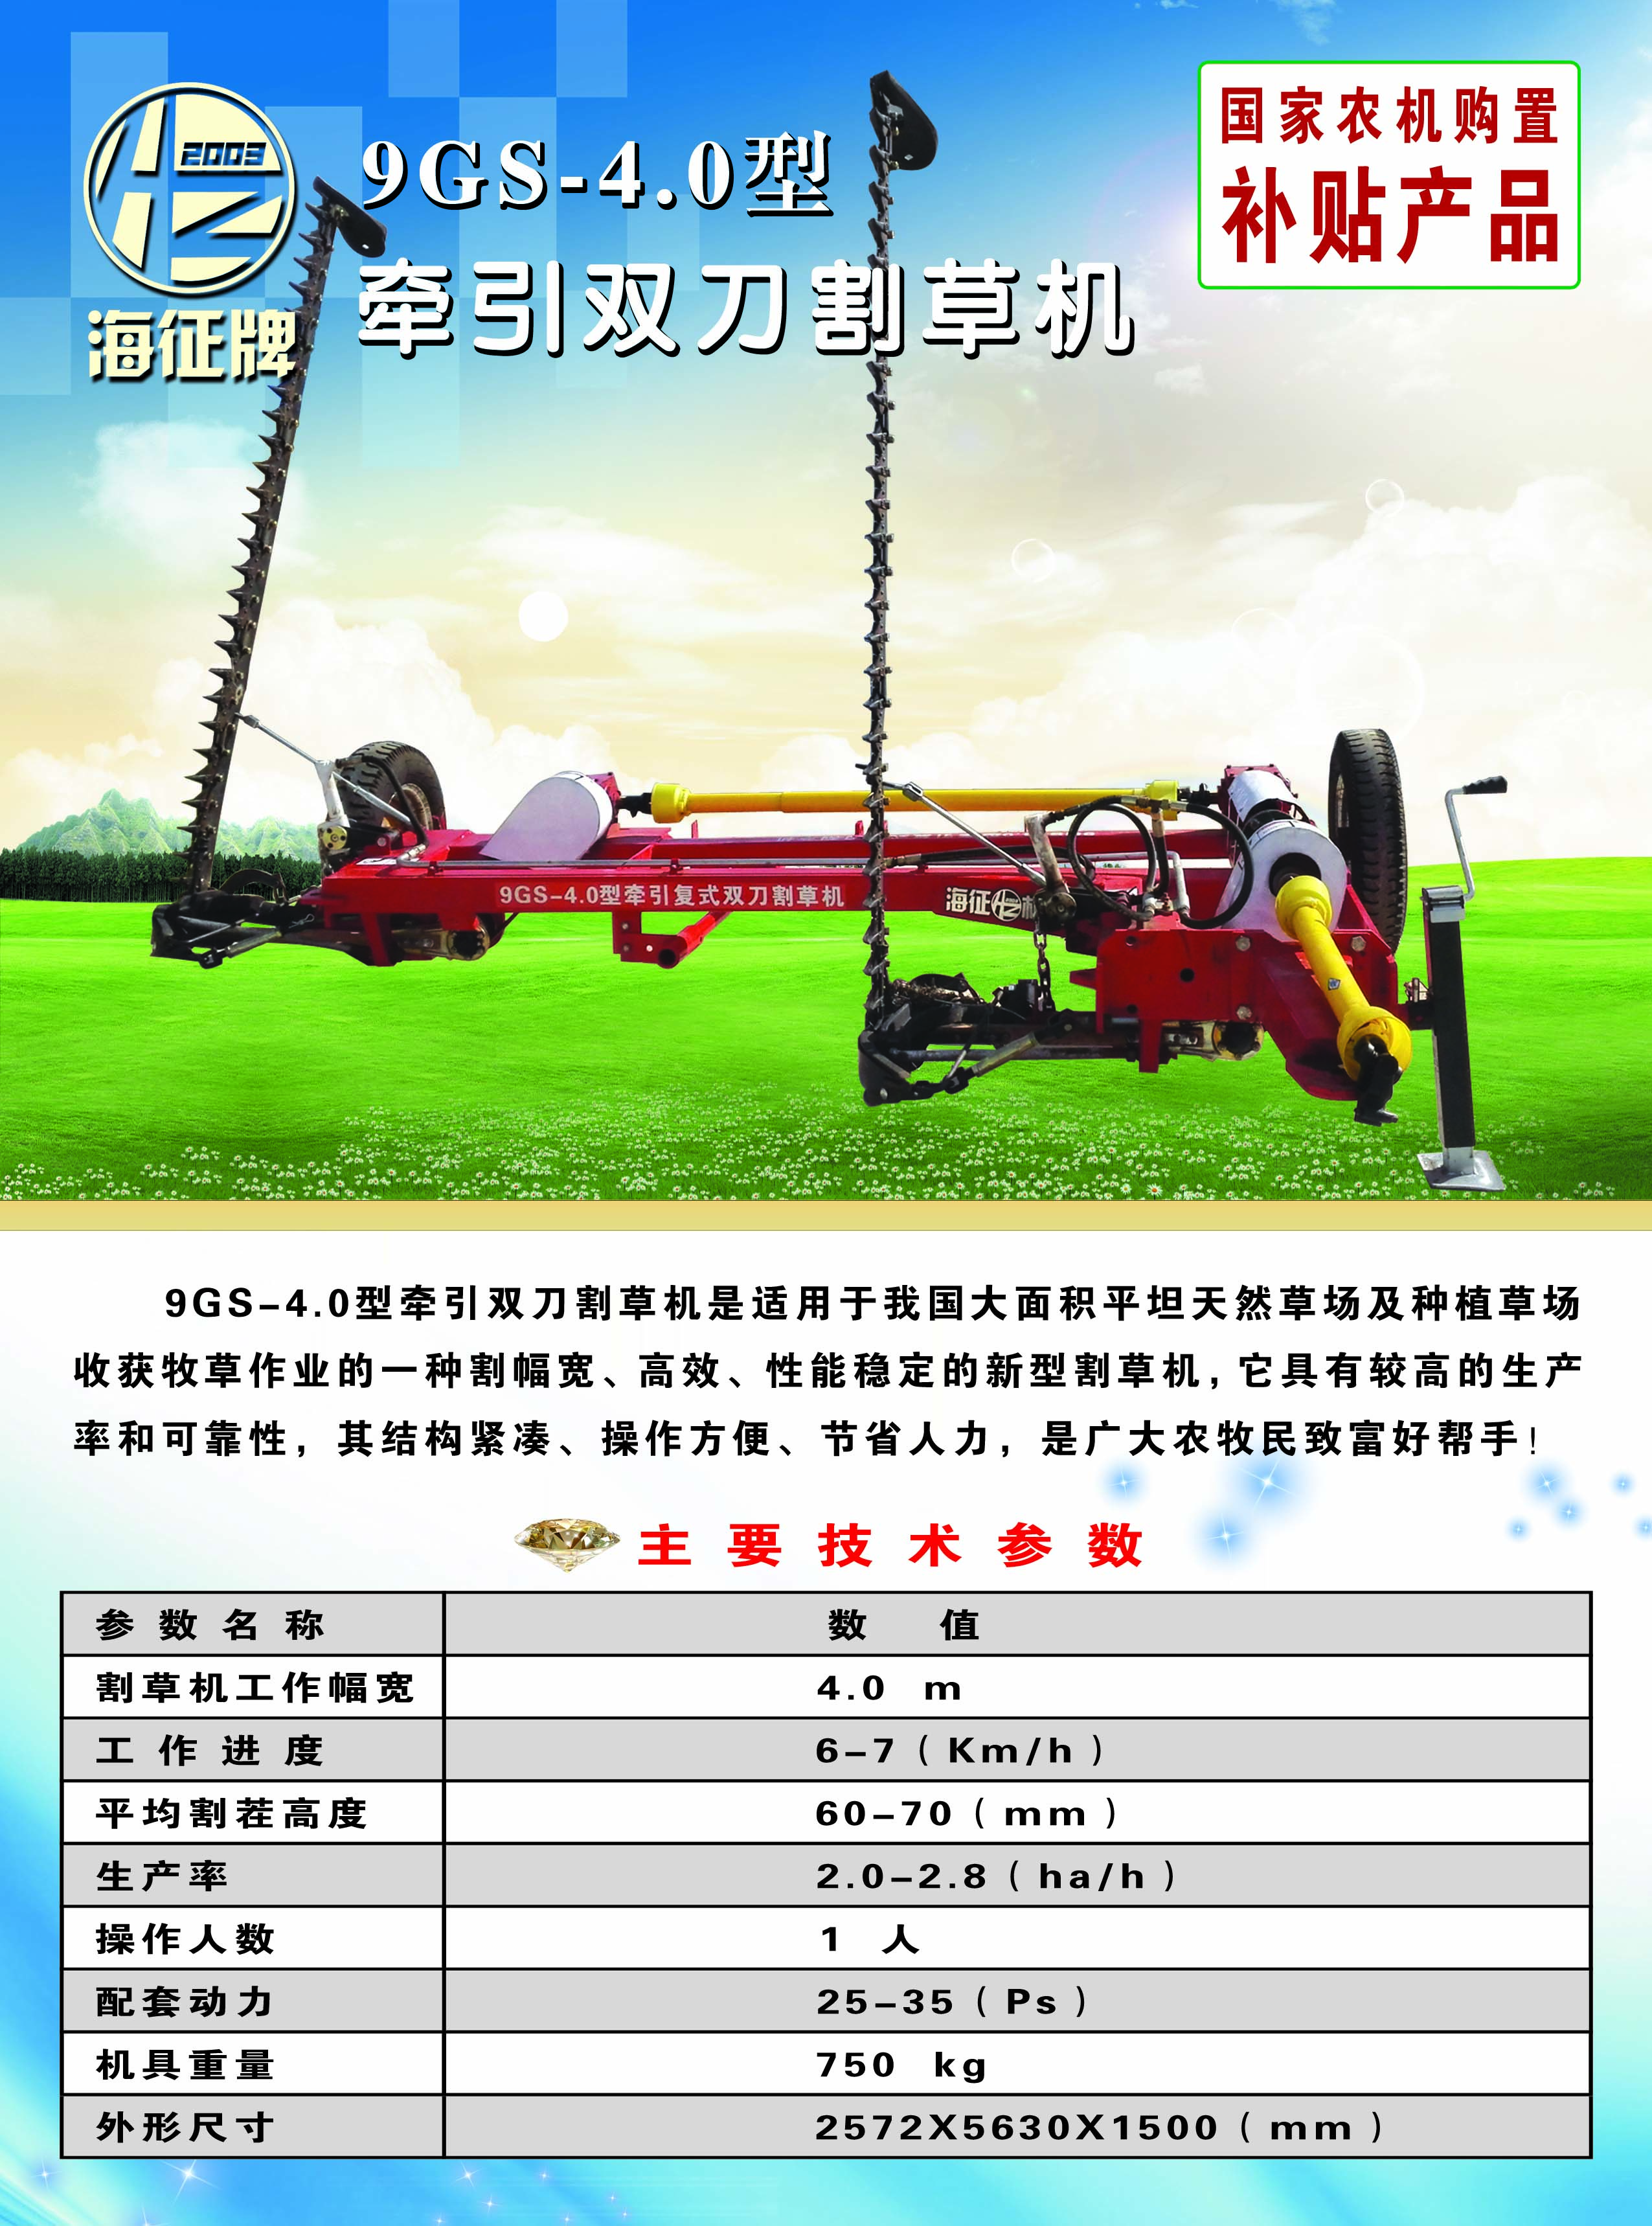 9GS-4.0型牵引双刀割草机